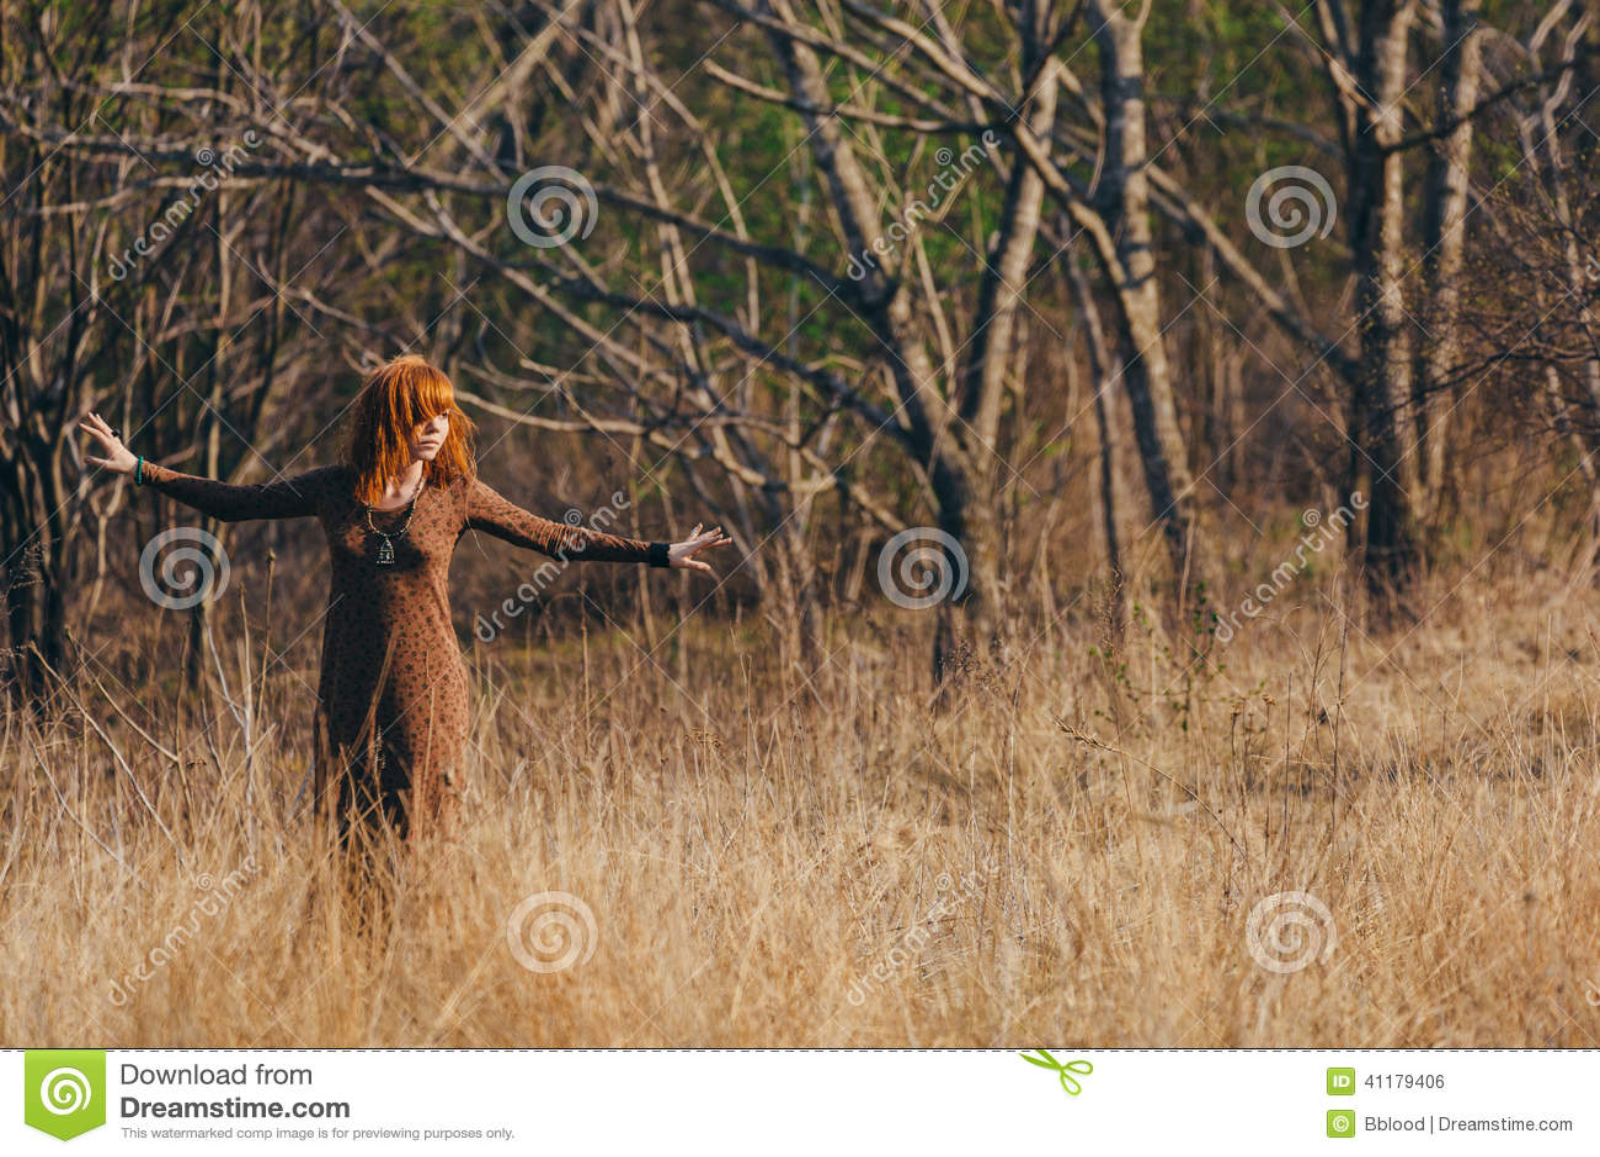 woman walking in grass - photo #15